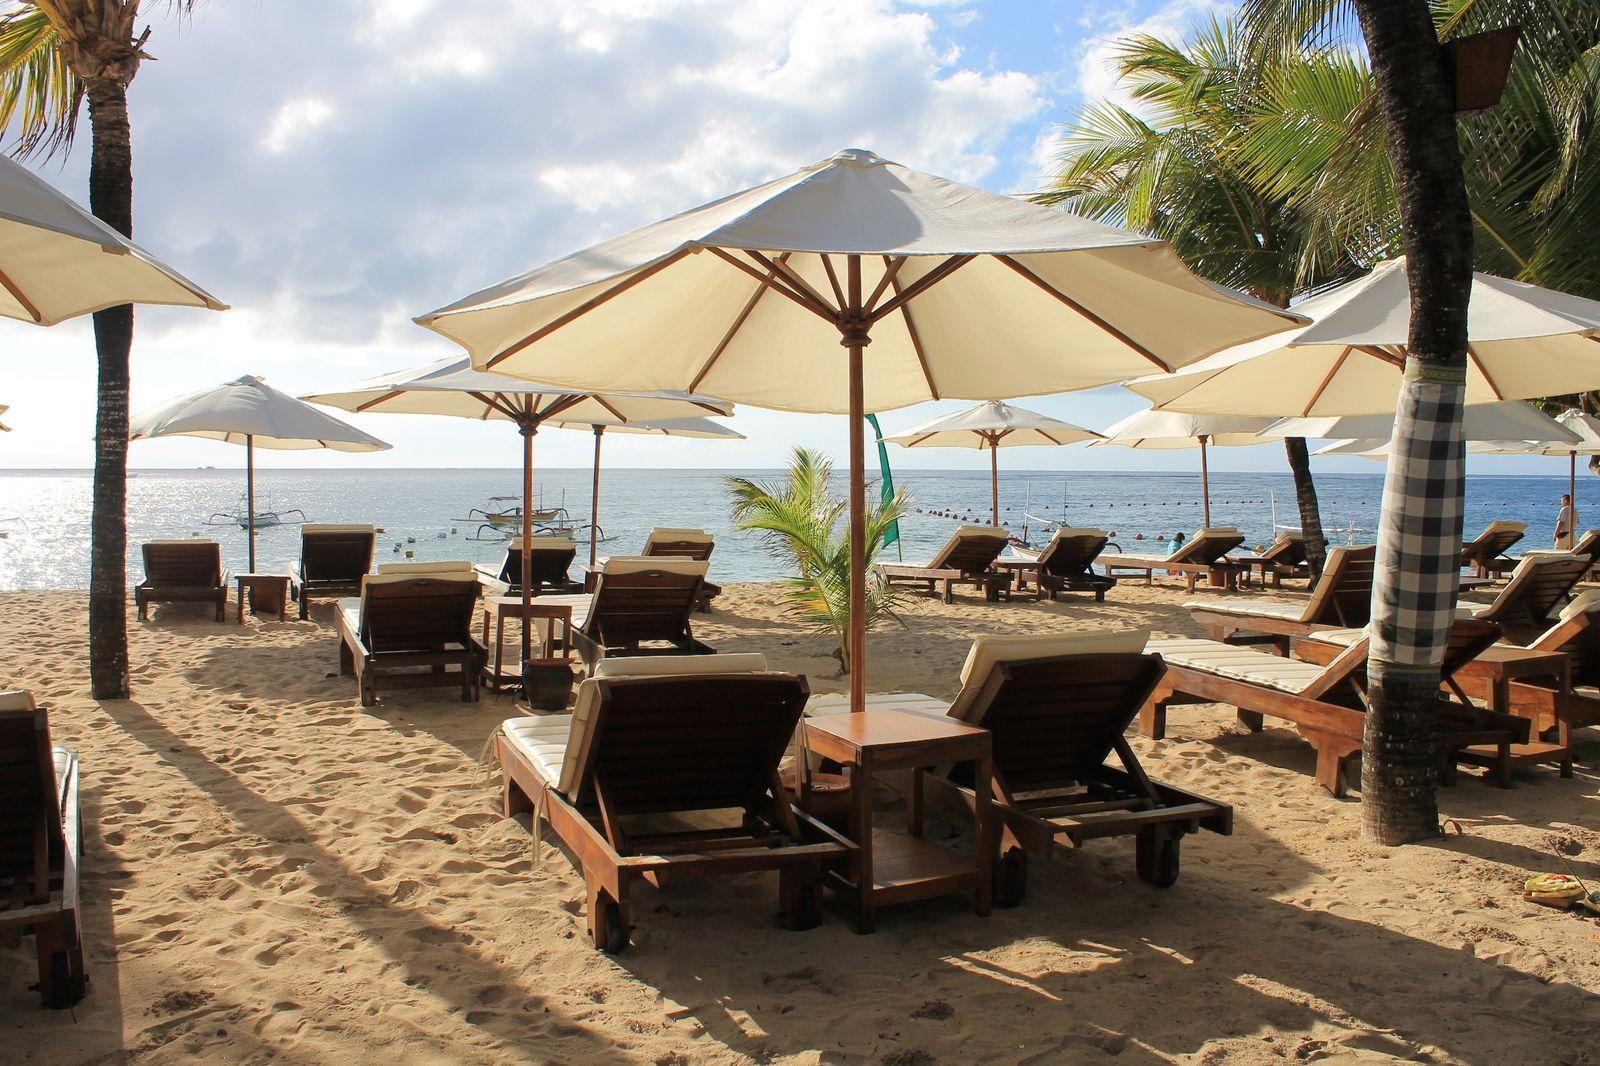 cooee bali reef resort asienreisen von asian dreams gmbh. Black Bedroom Furniture Sets. Home Design Ideas